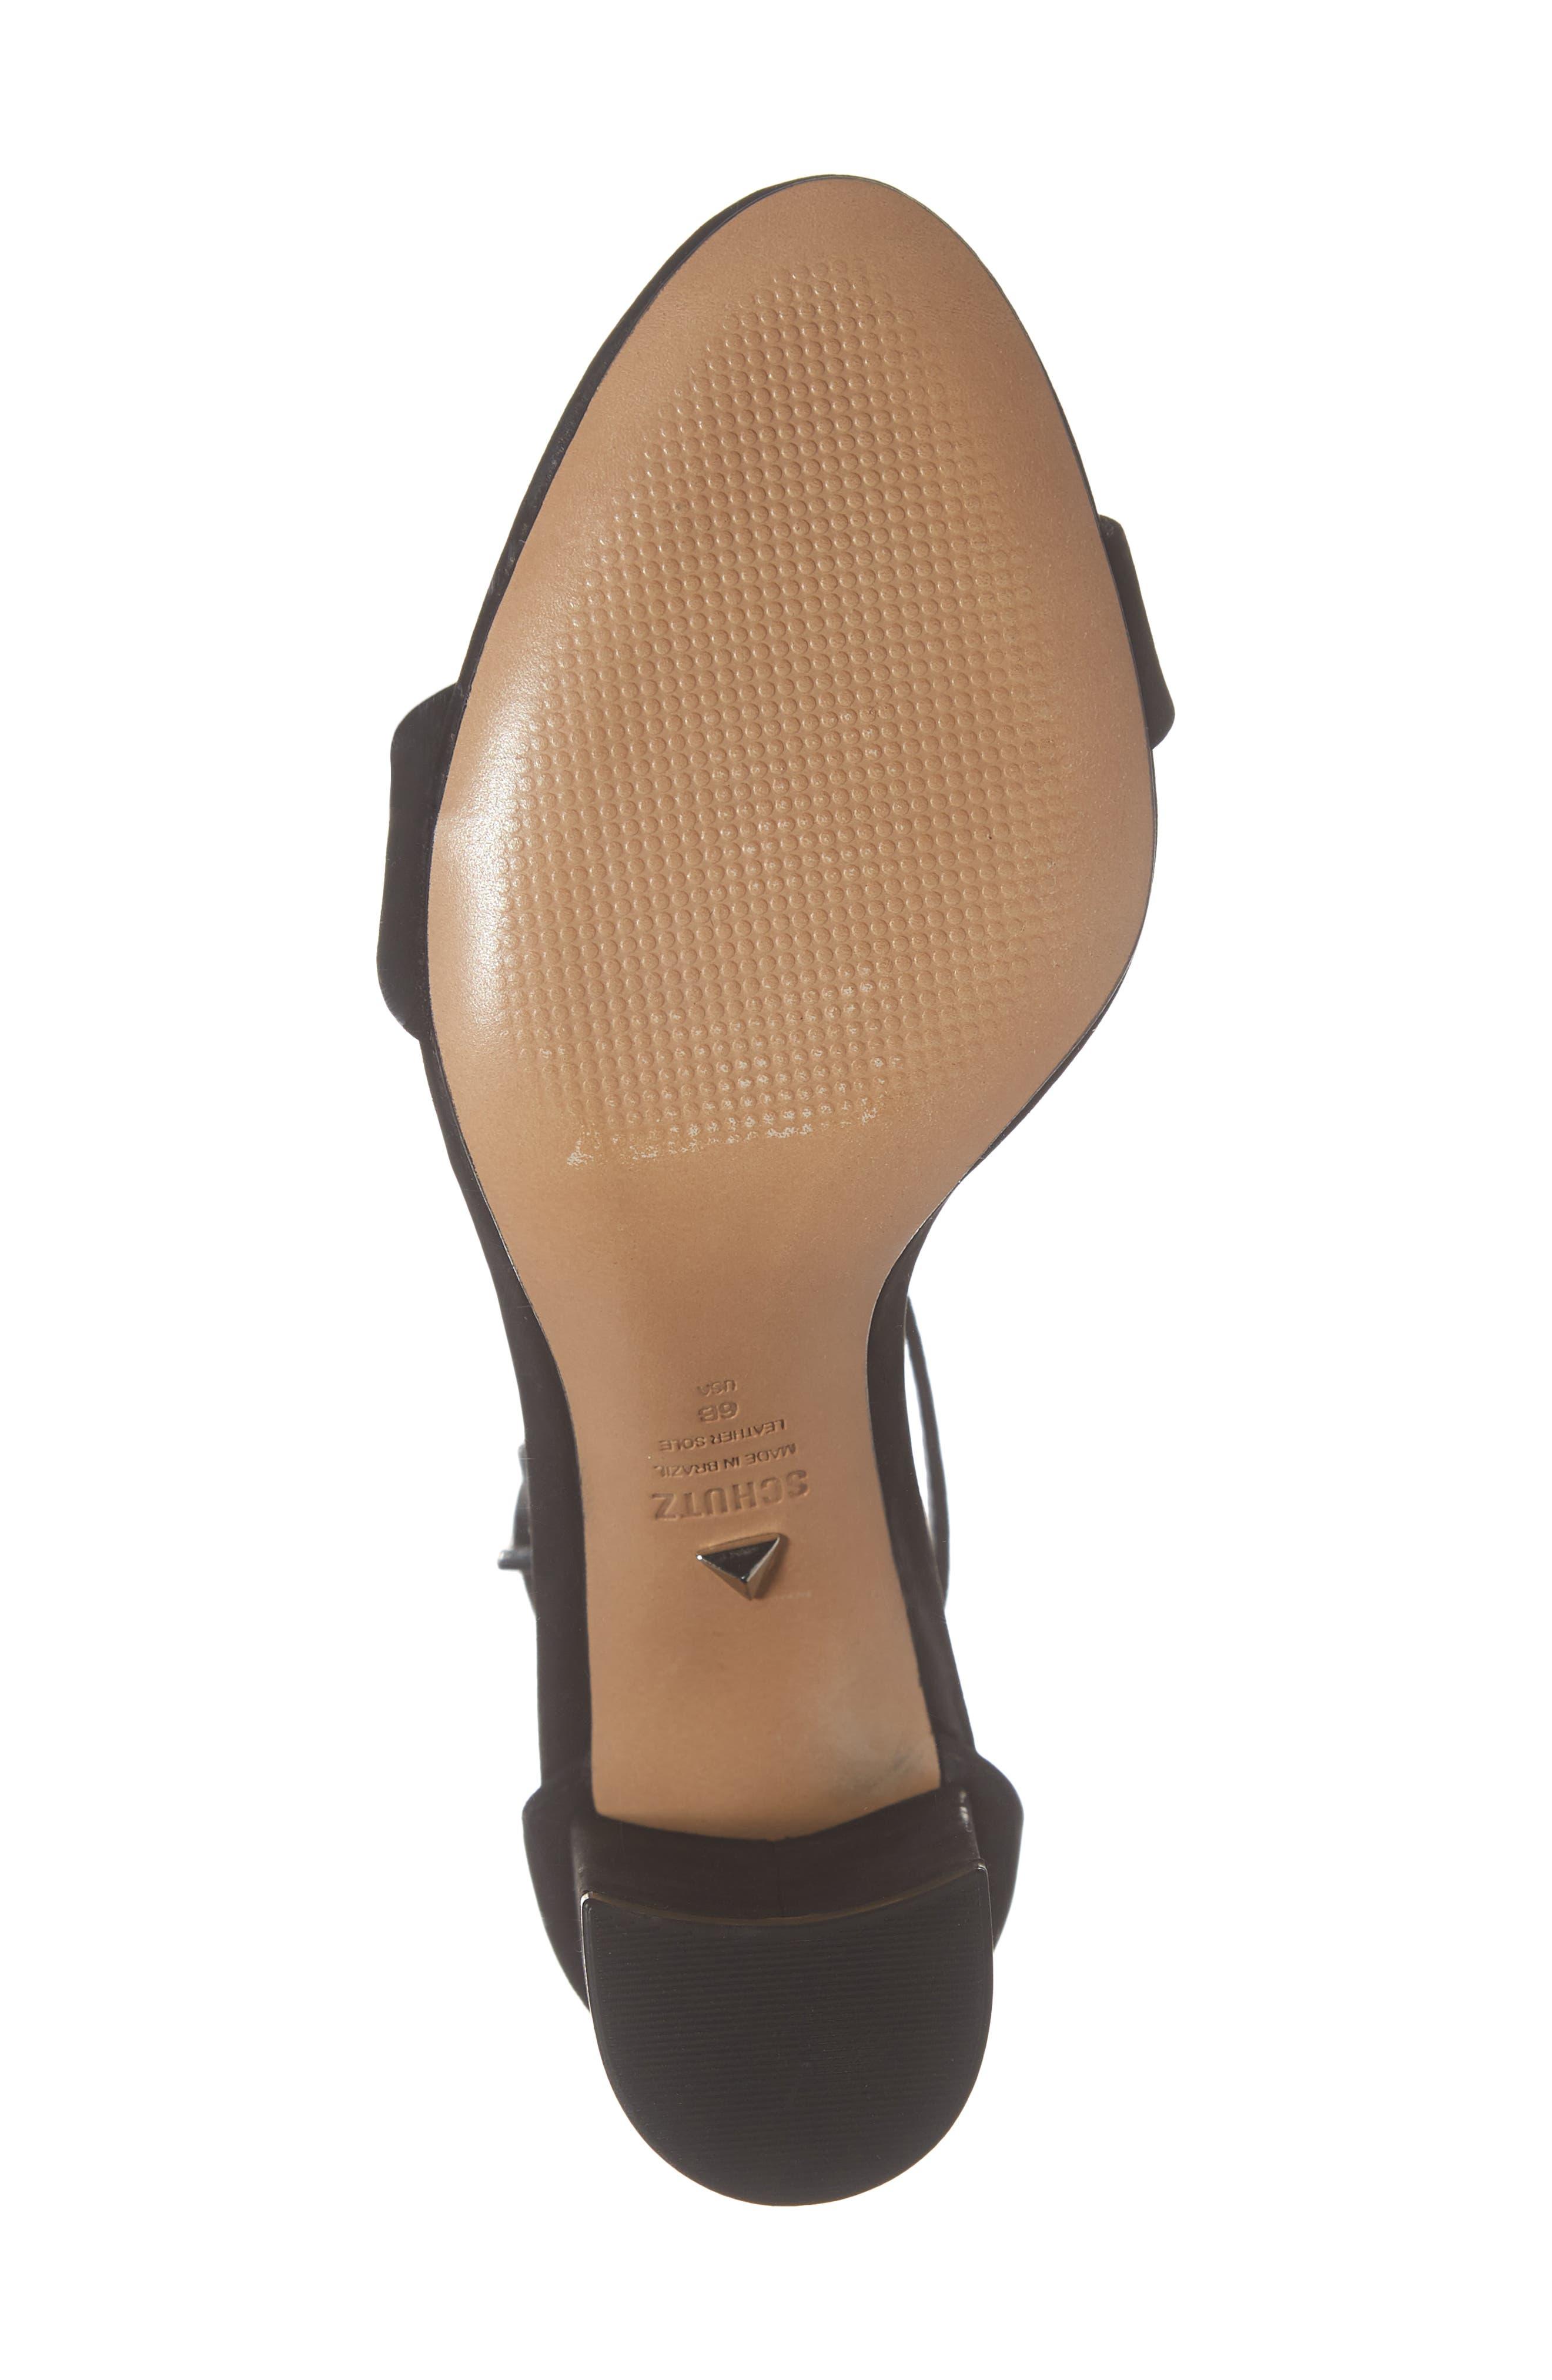 Anna Lee Ankle Strap Sandal,                             Alternate thumbnail 6, color,                             BLACK NUBUCK LEATHER